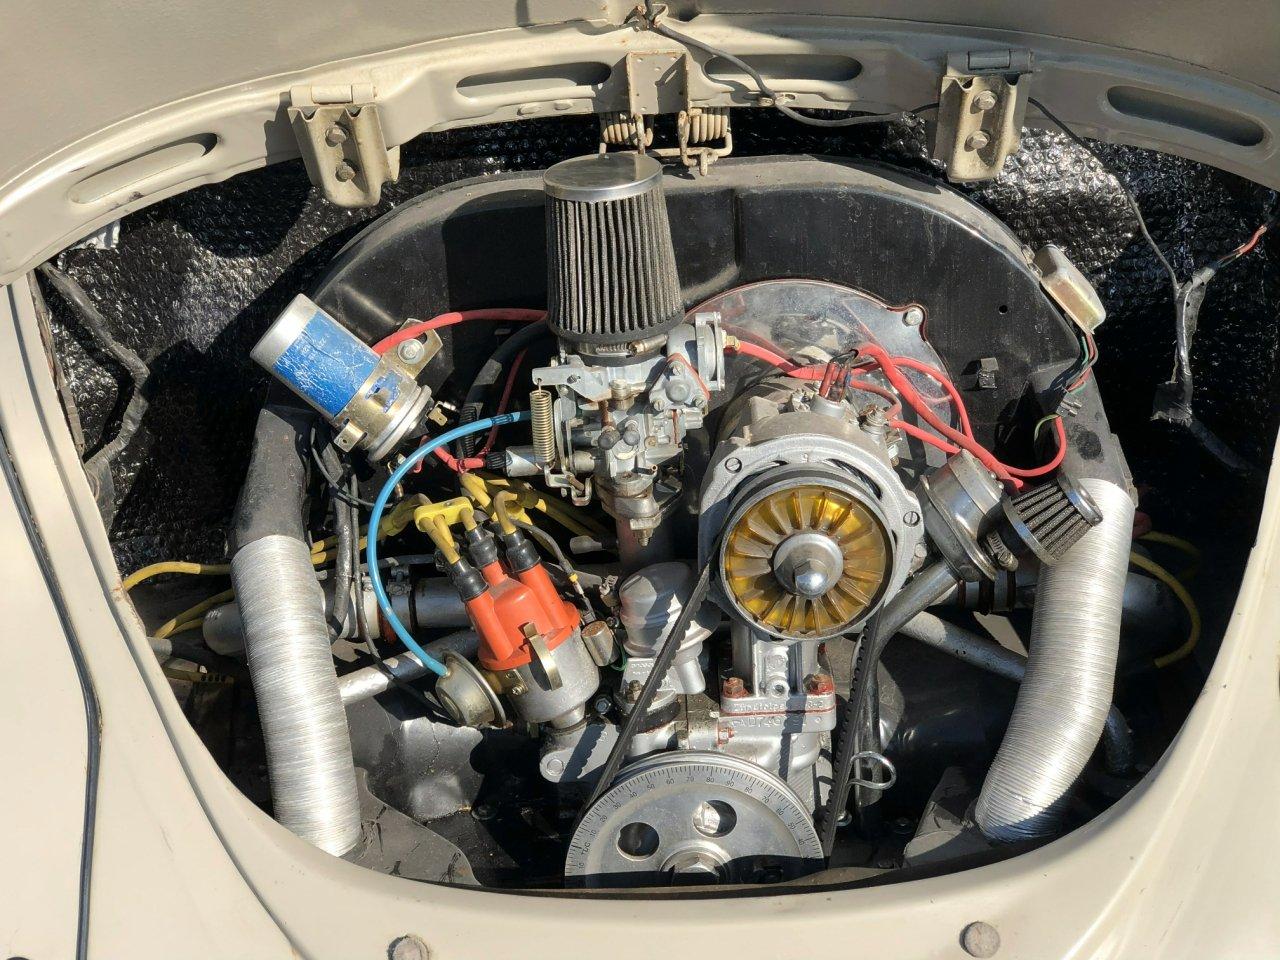 1966 Volkswagen Beetle 1600cc SOLD (picture 6 of 6)